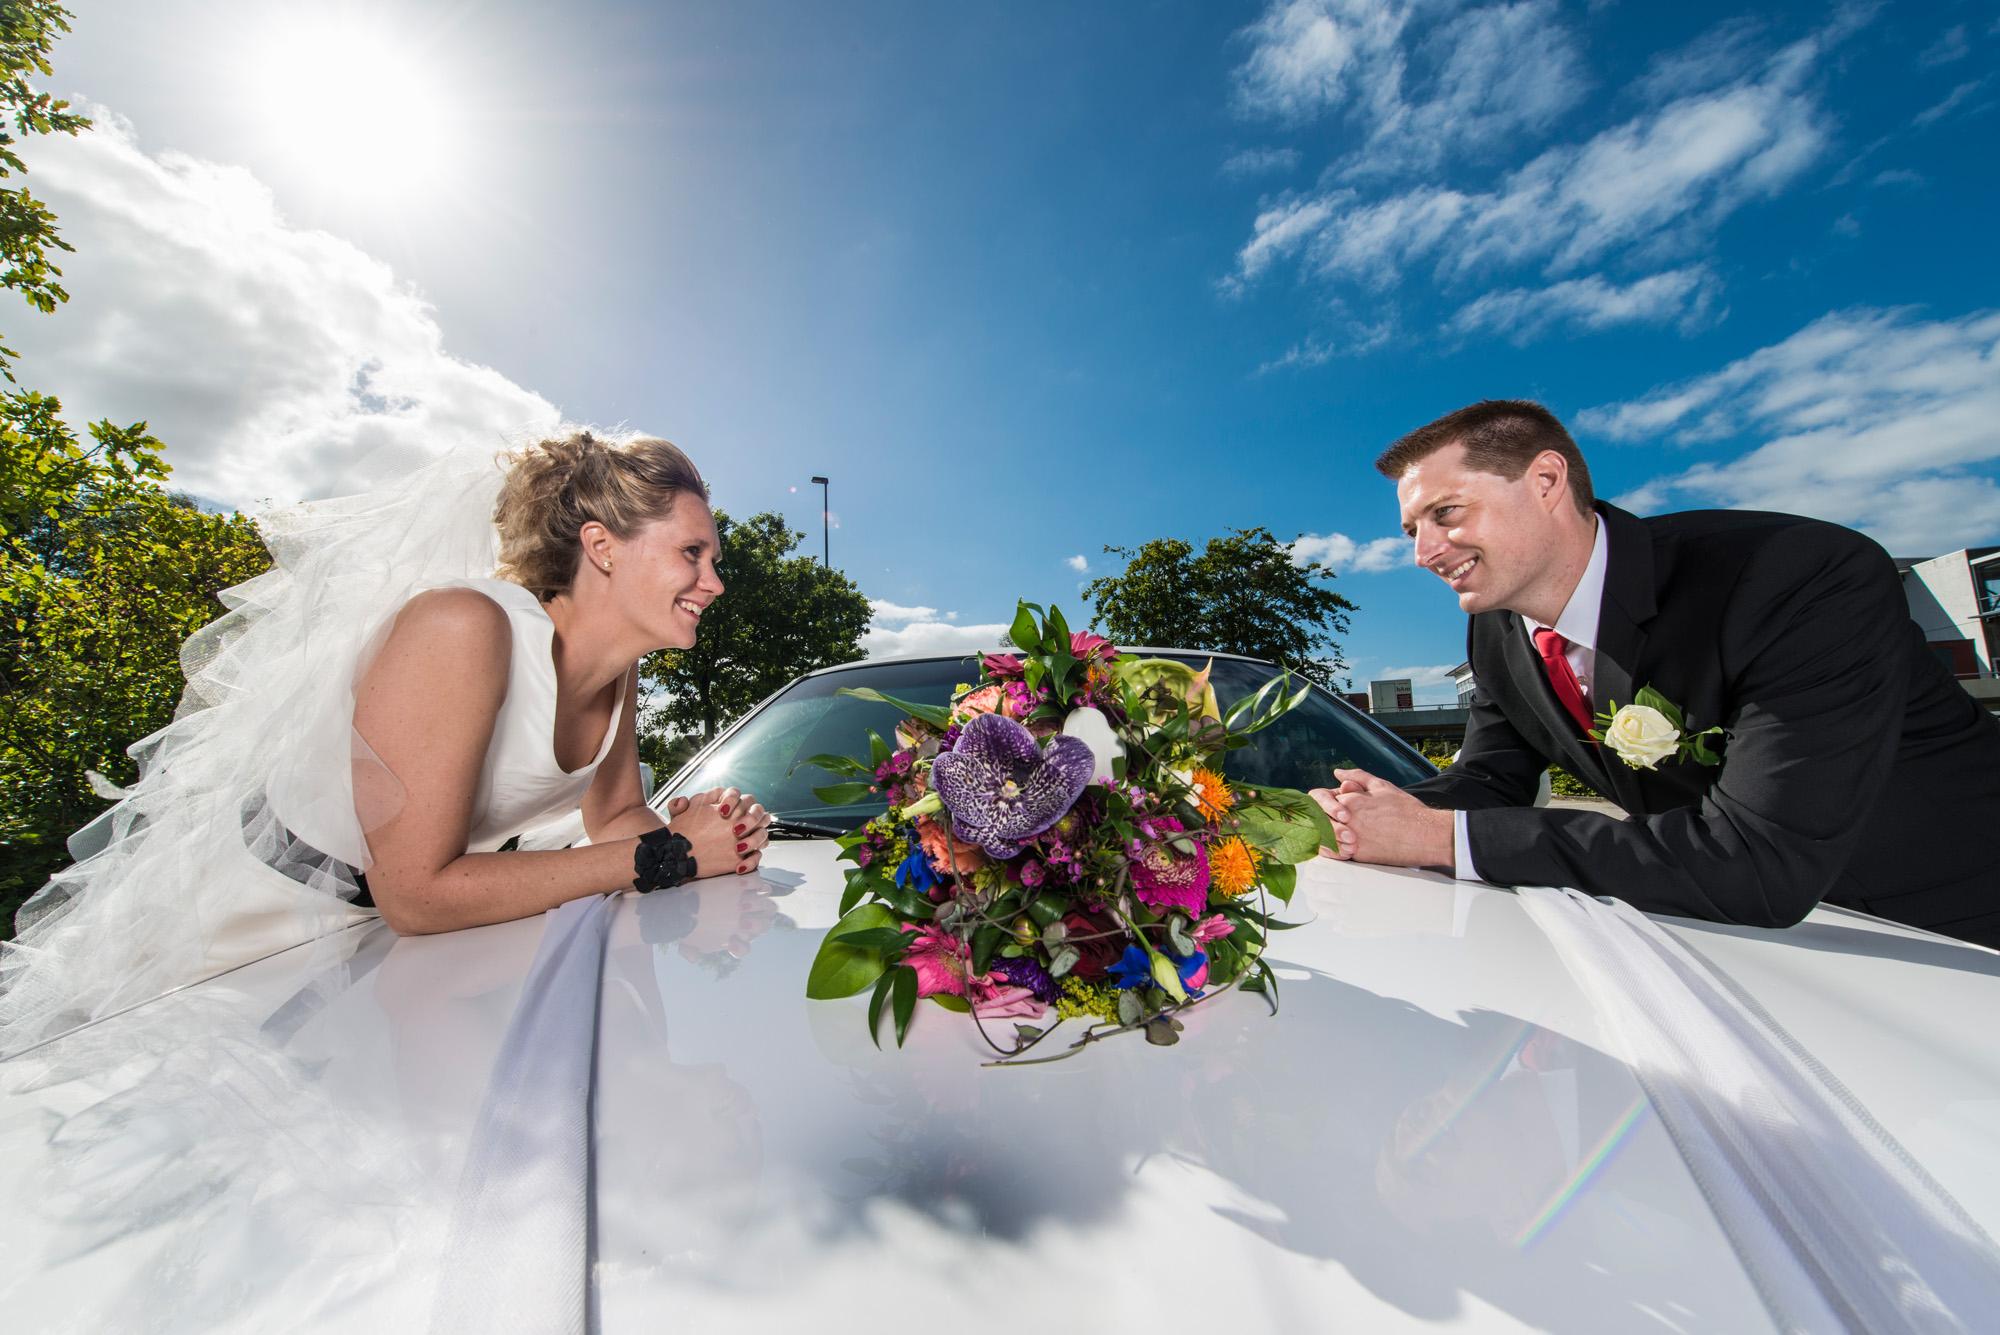 Bryllupsfotografering over bryllupskareten